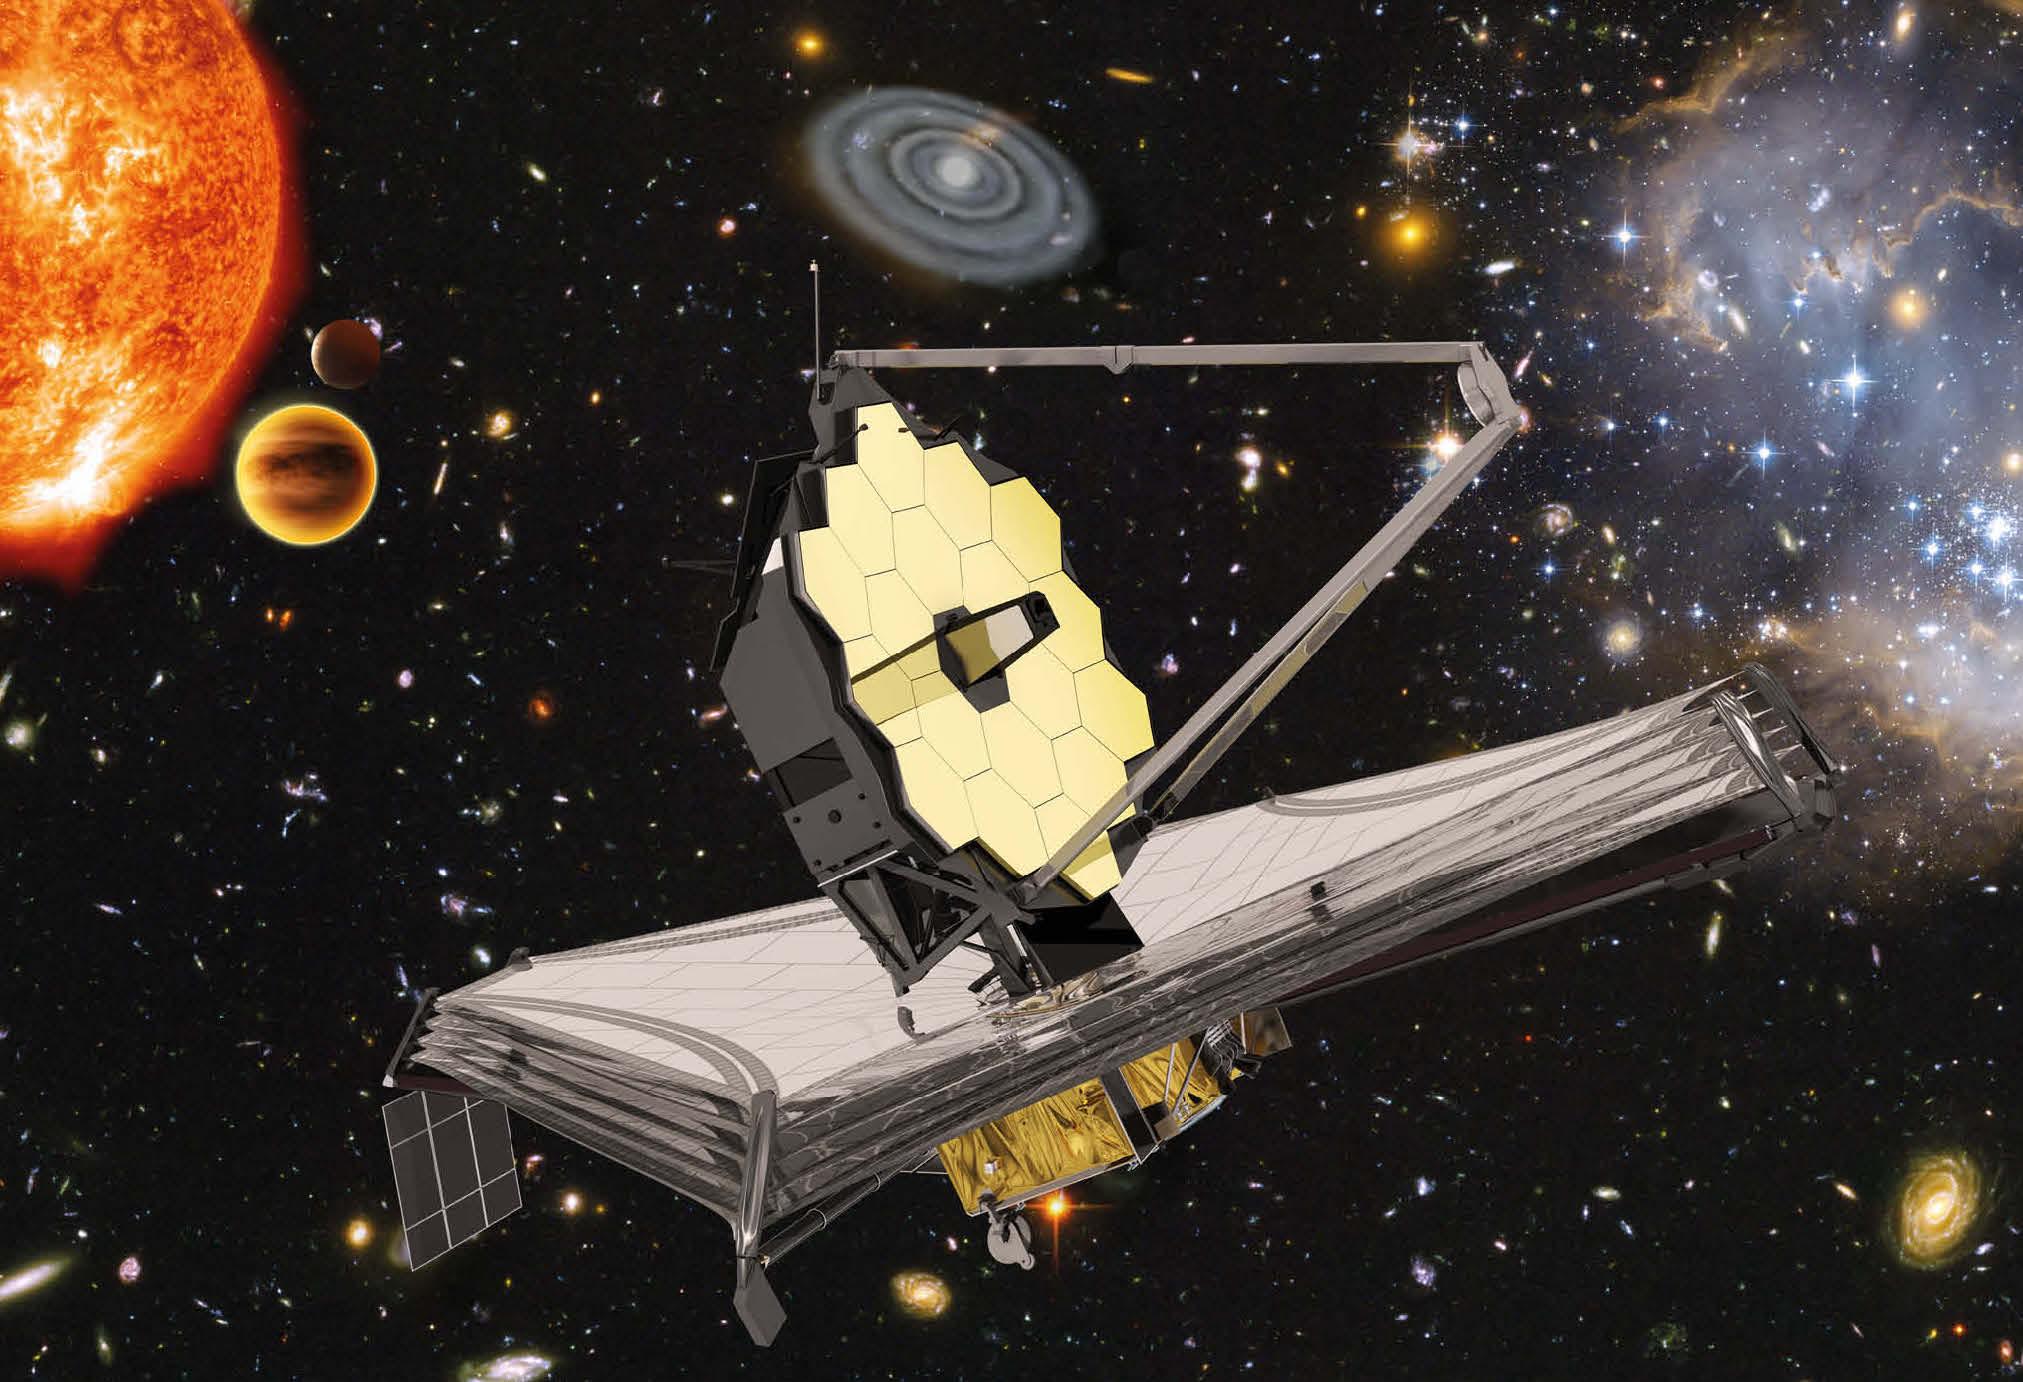 Etiket amatör astronomi kozmİk anafor